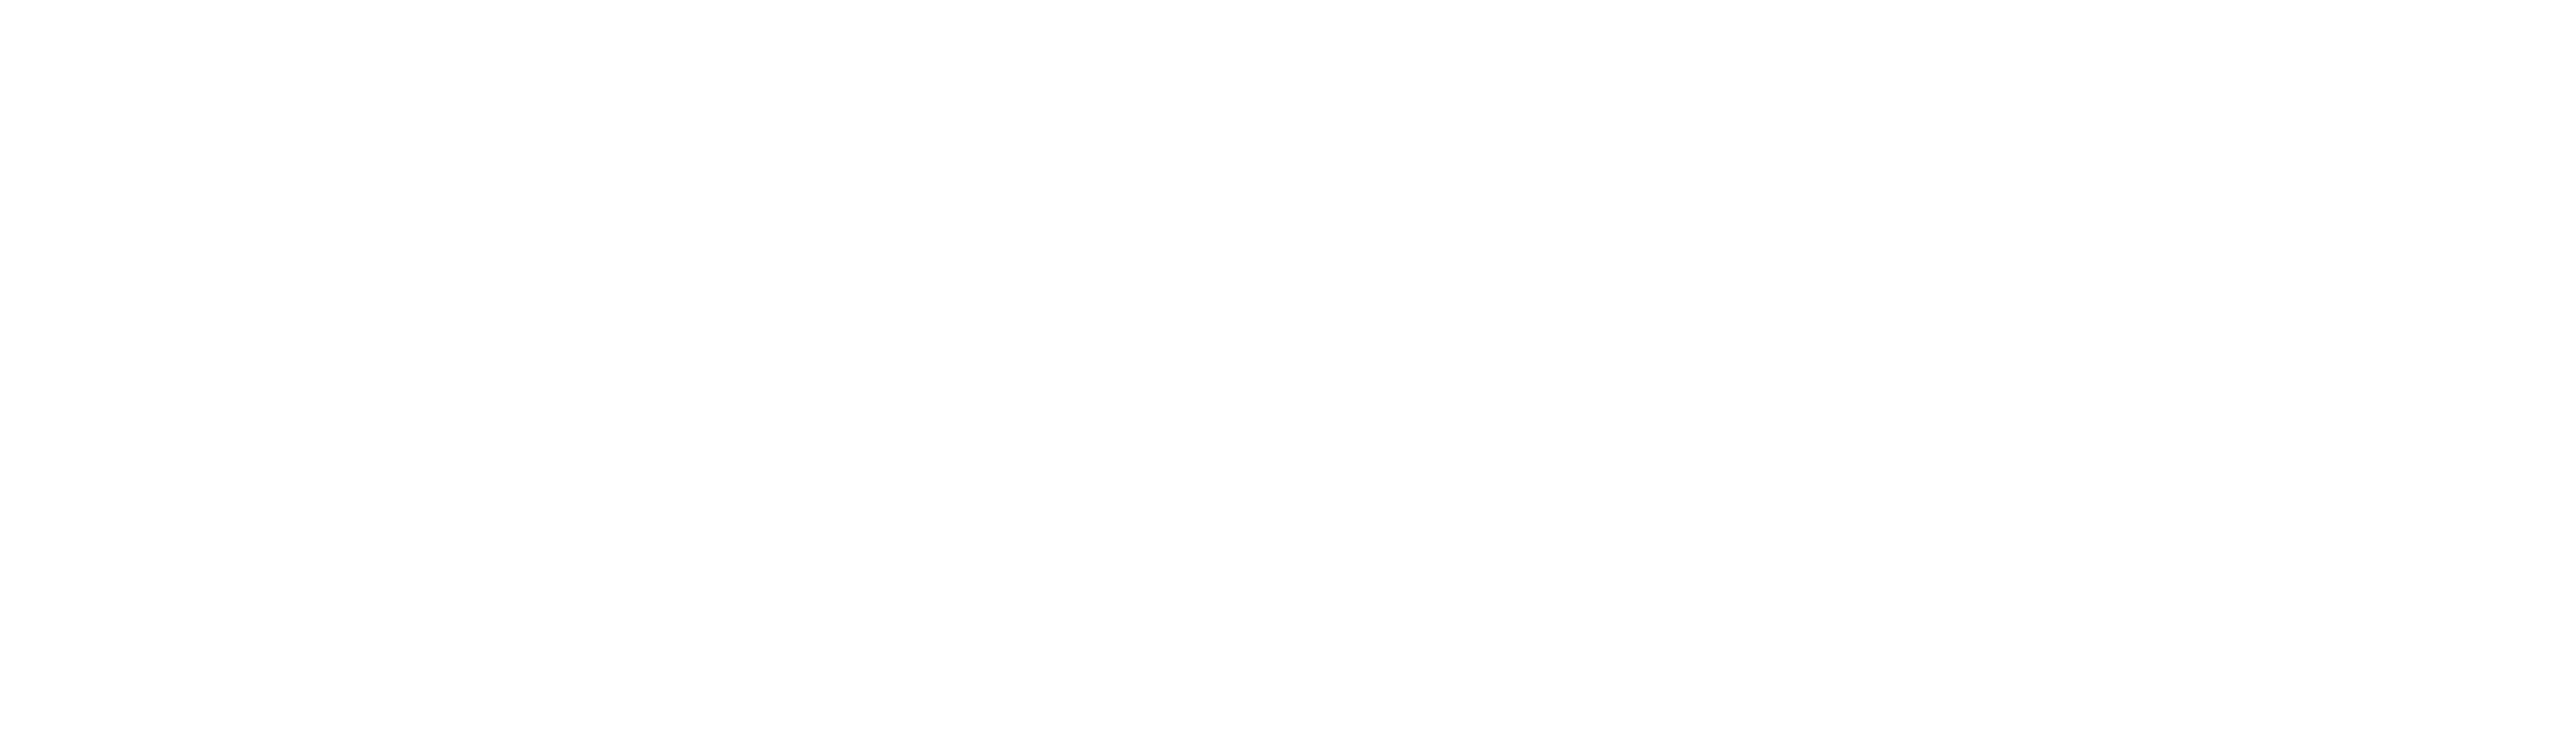 IHAF 3 - White